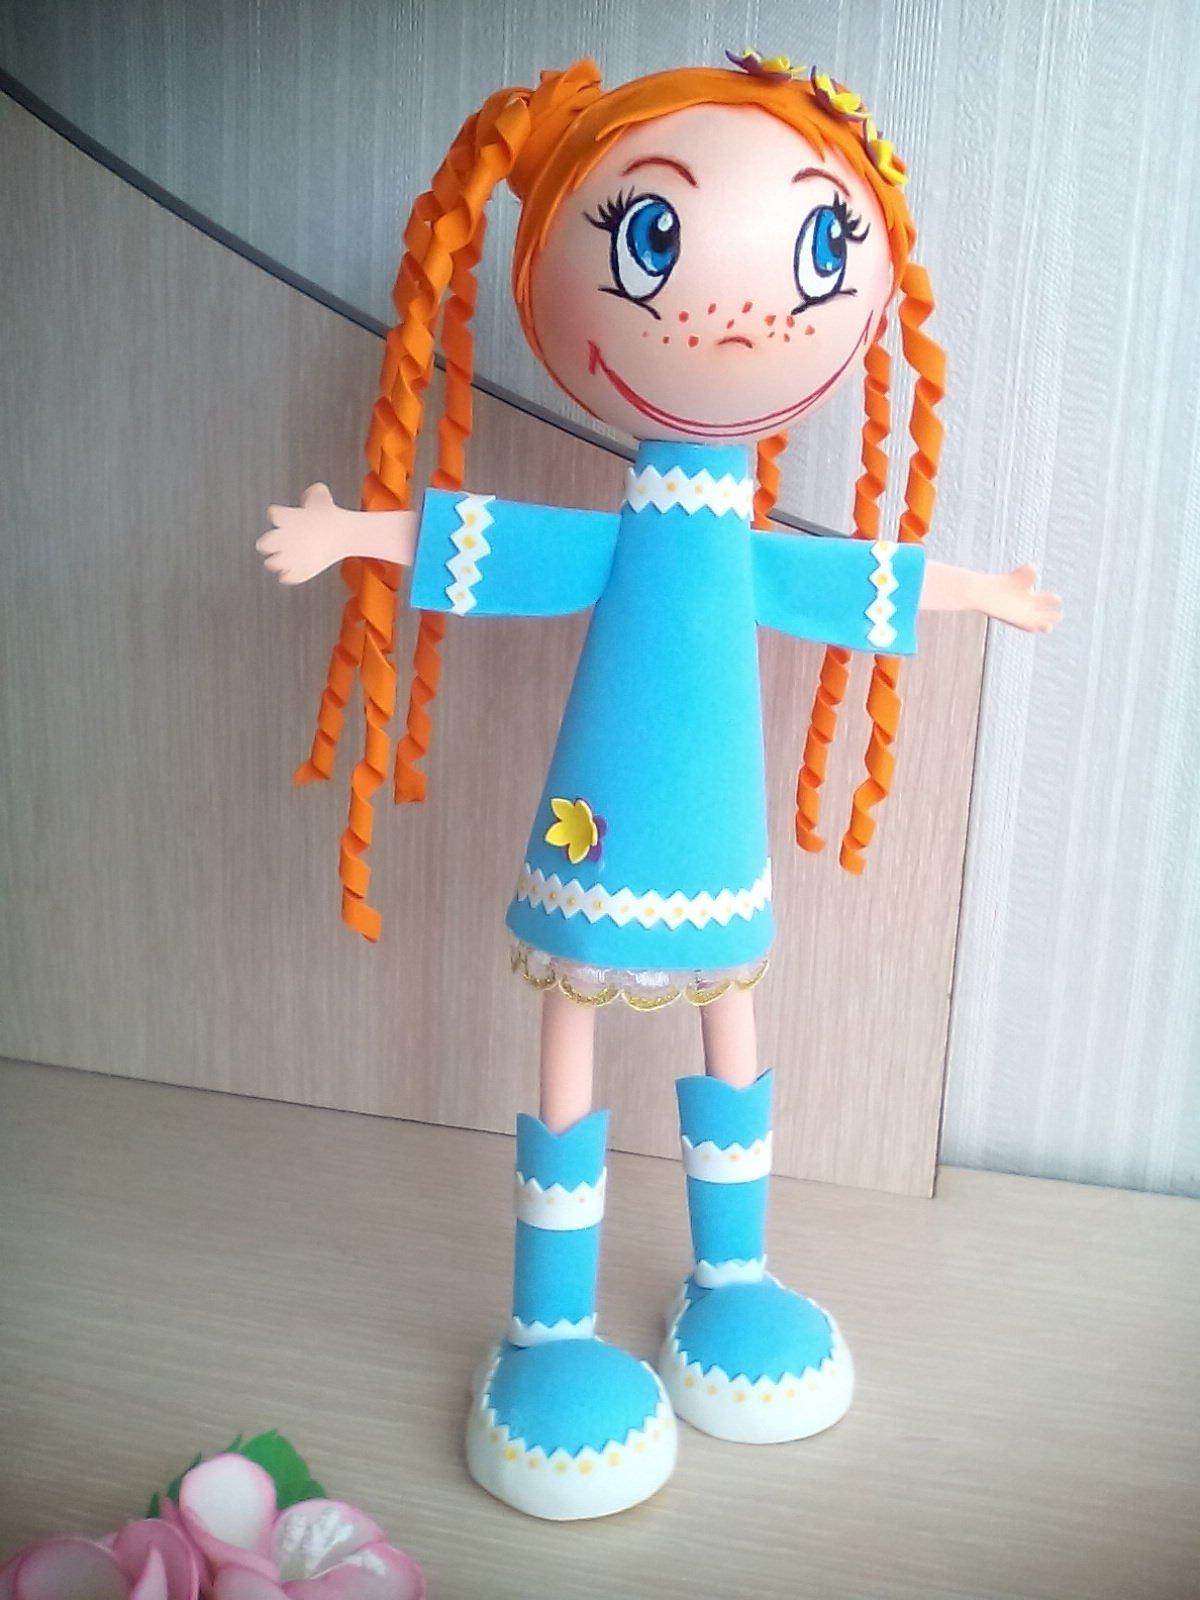 словам кукла из фоамирана своими руками все, чем